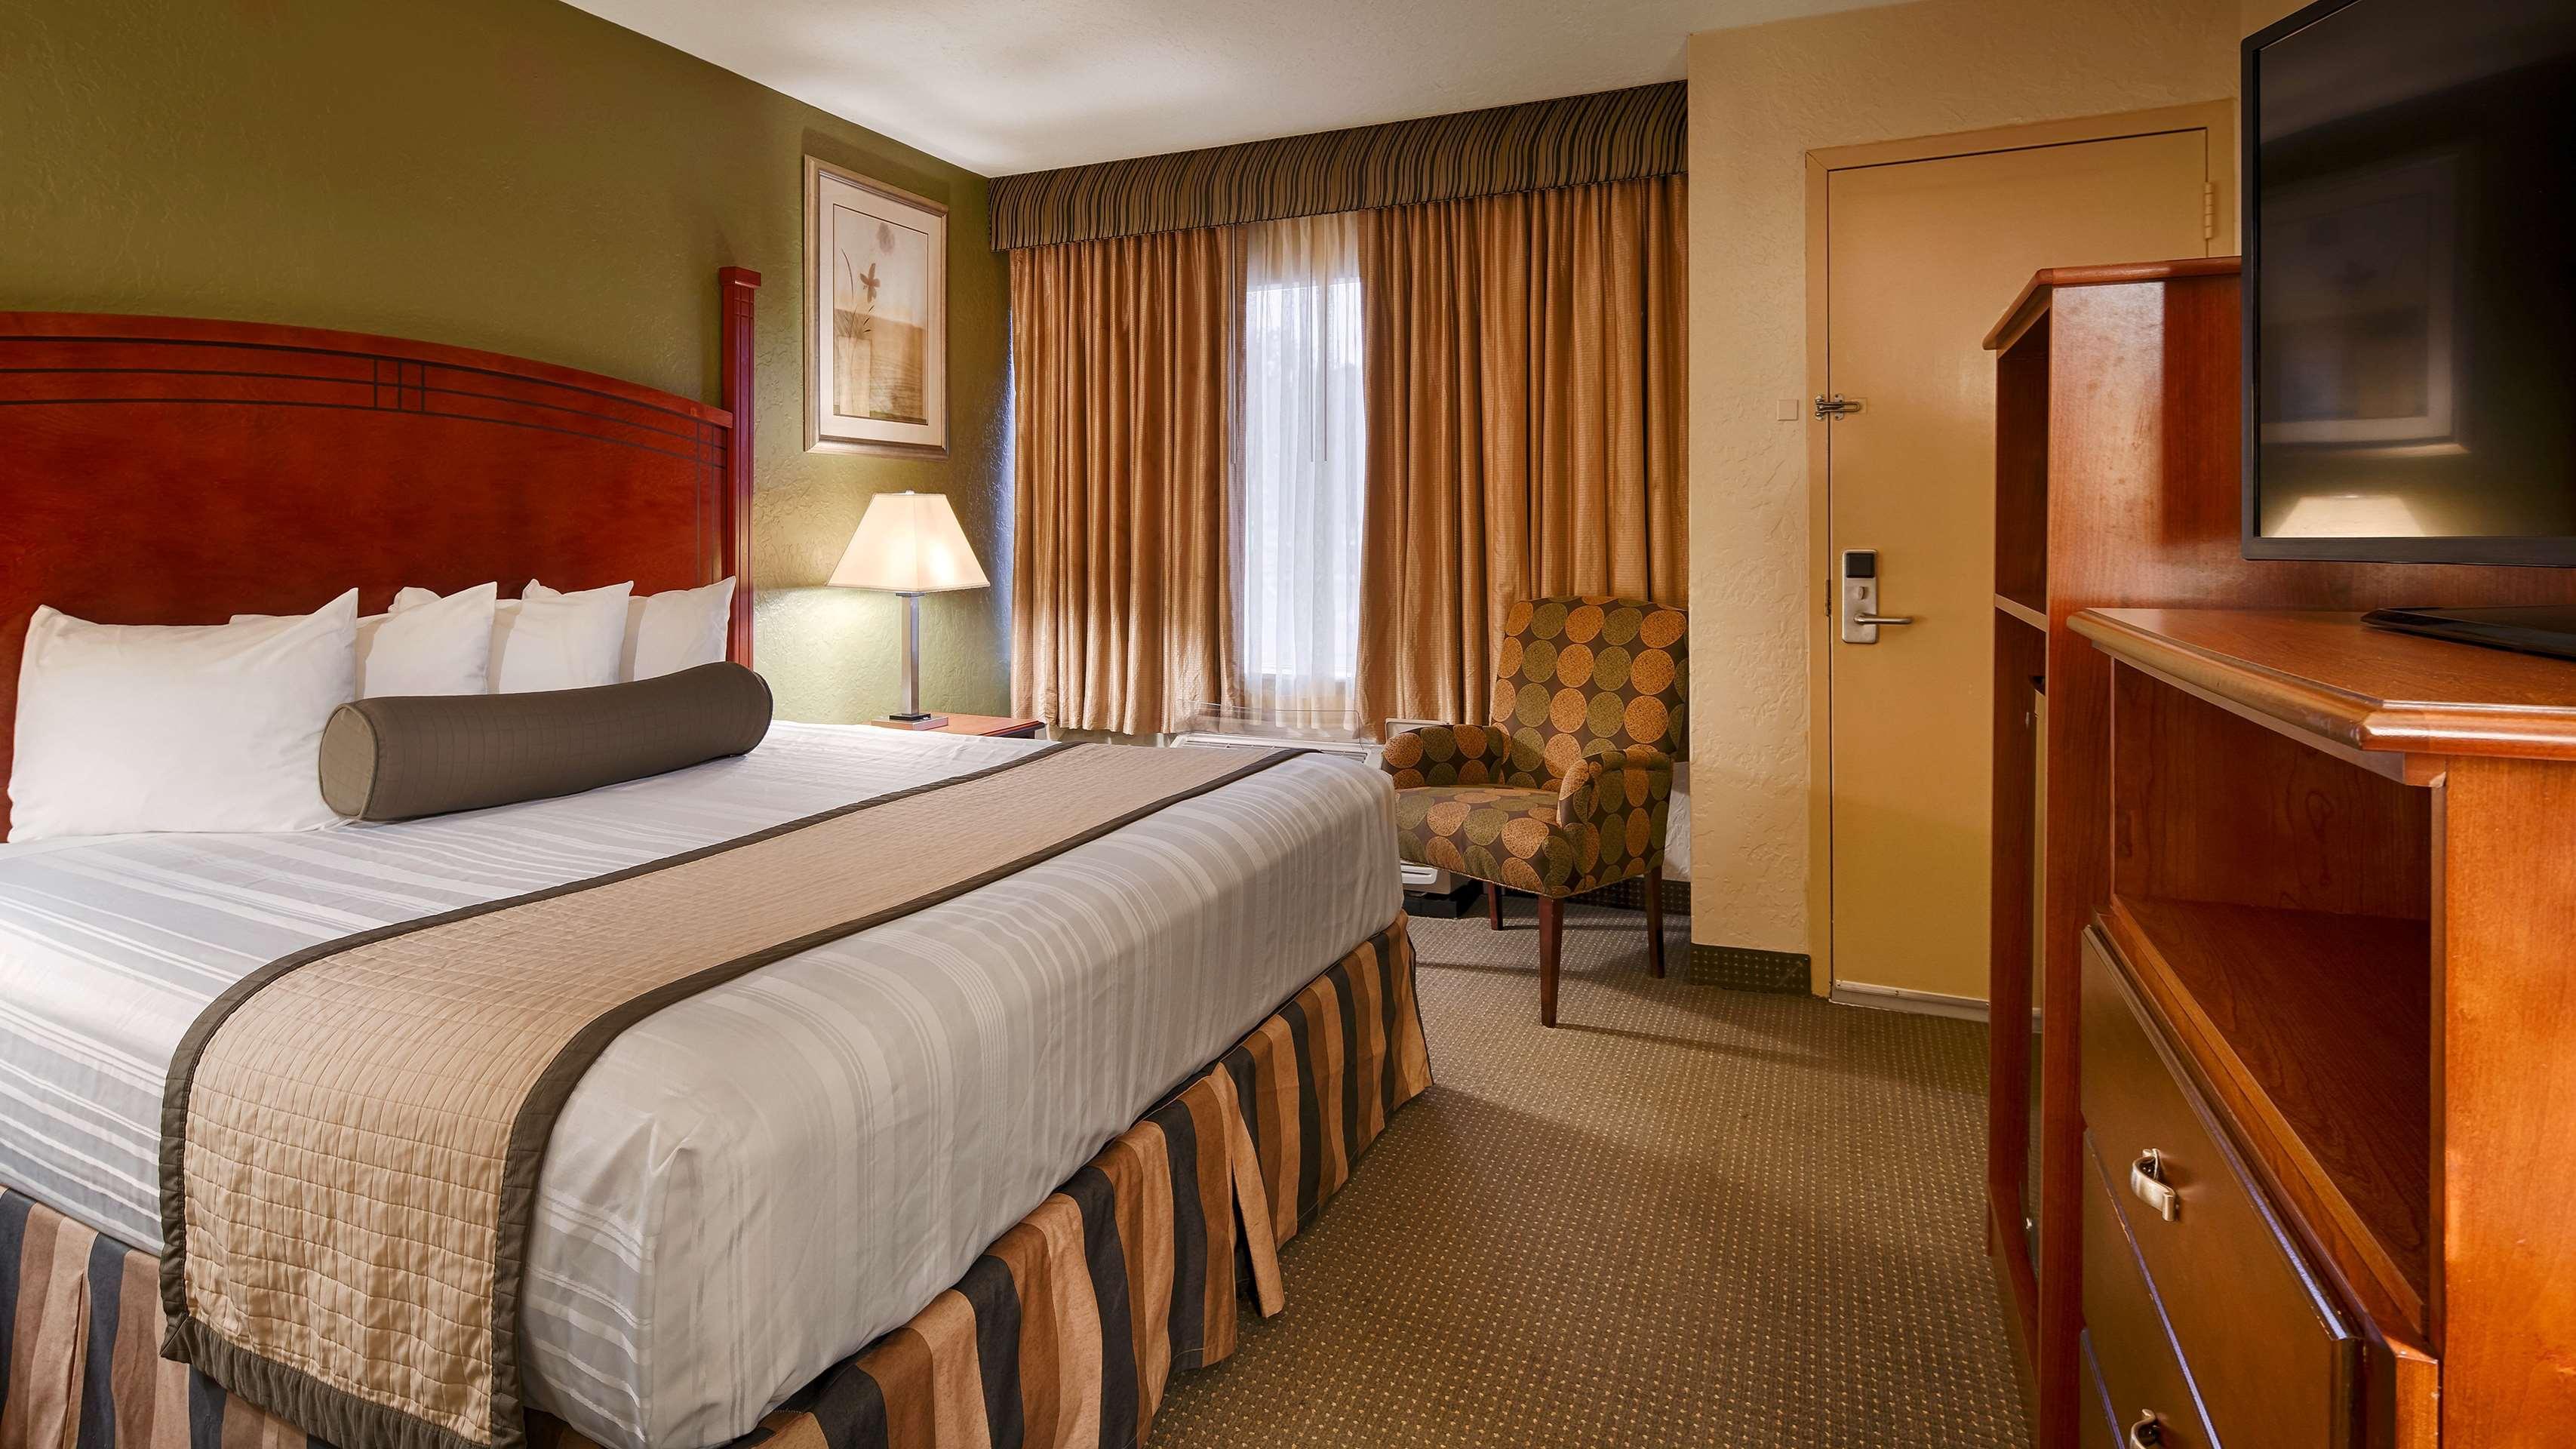 Best Western Plus Lawton Hotel & Convention Center image 8